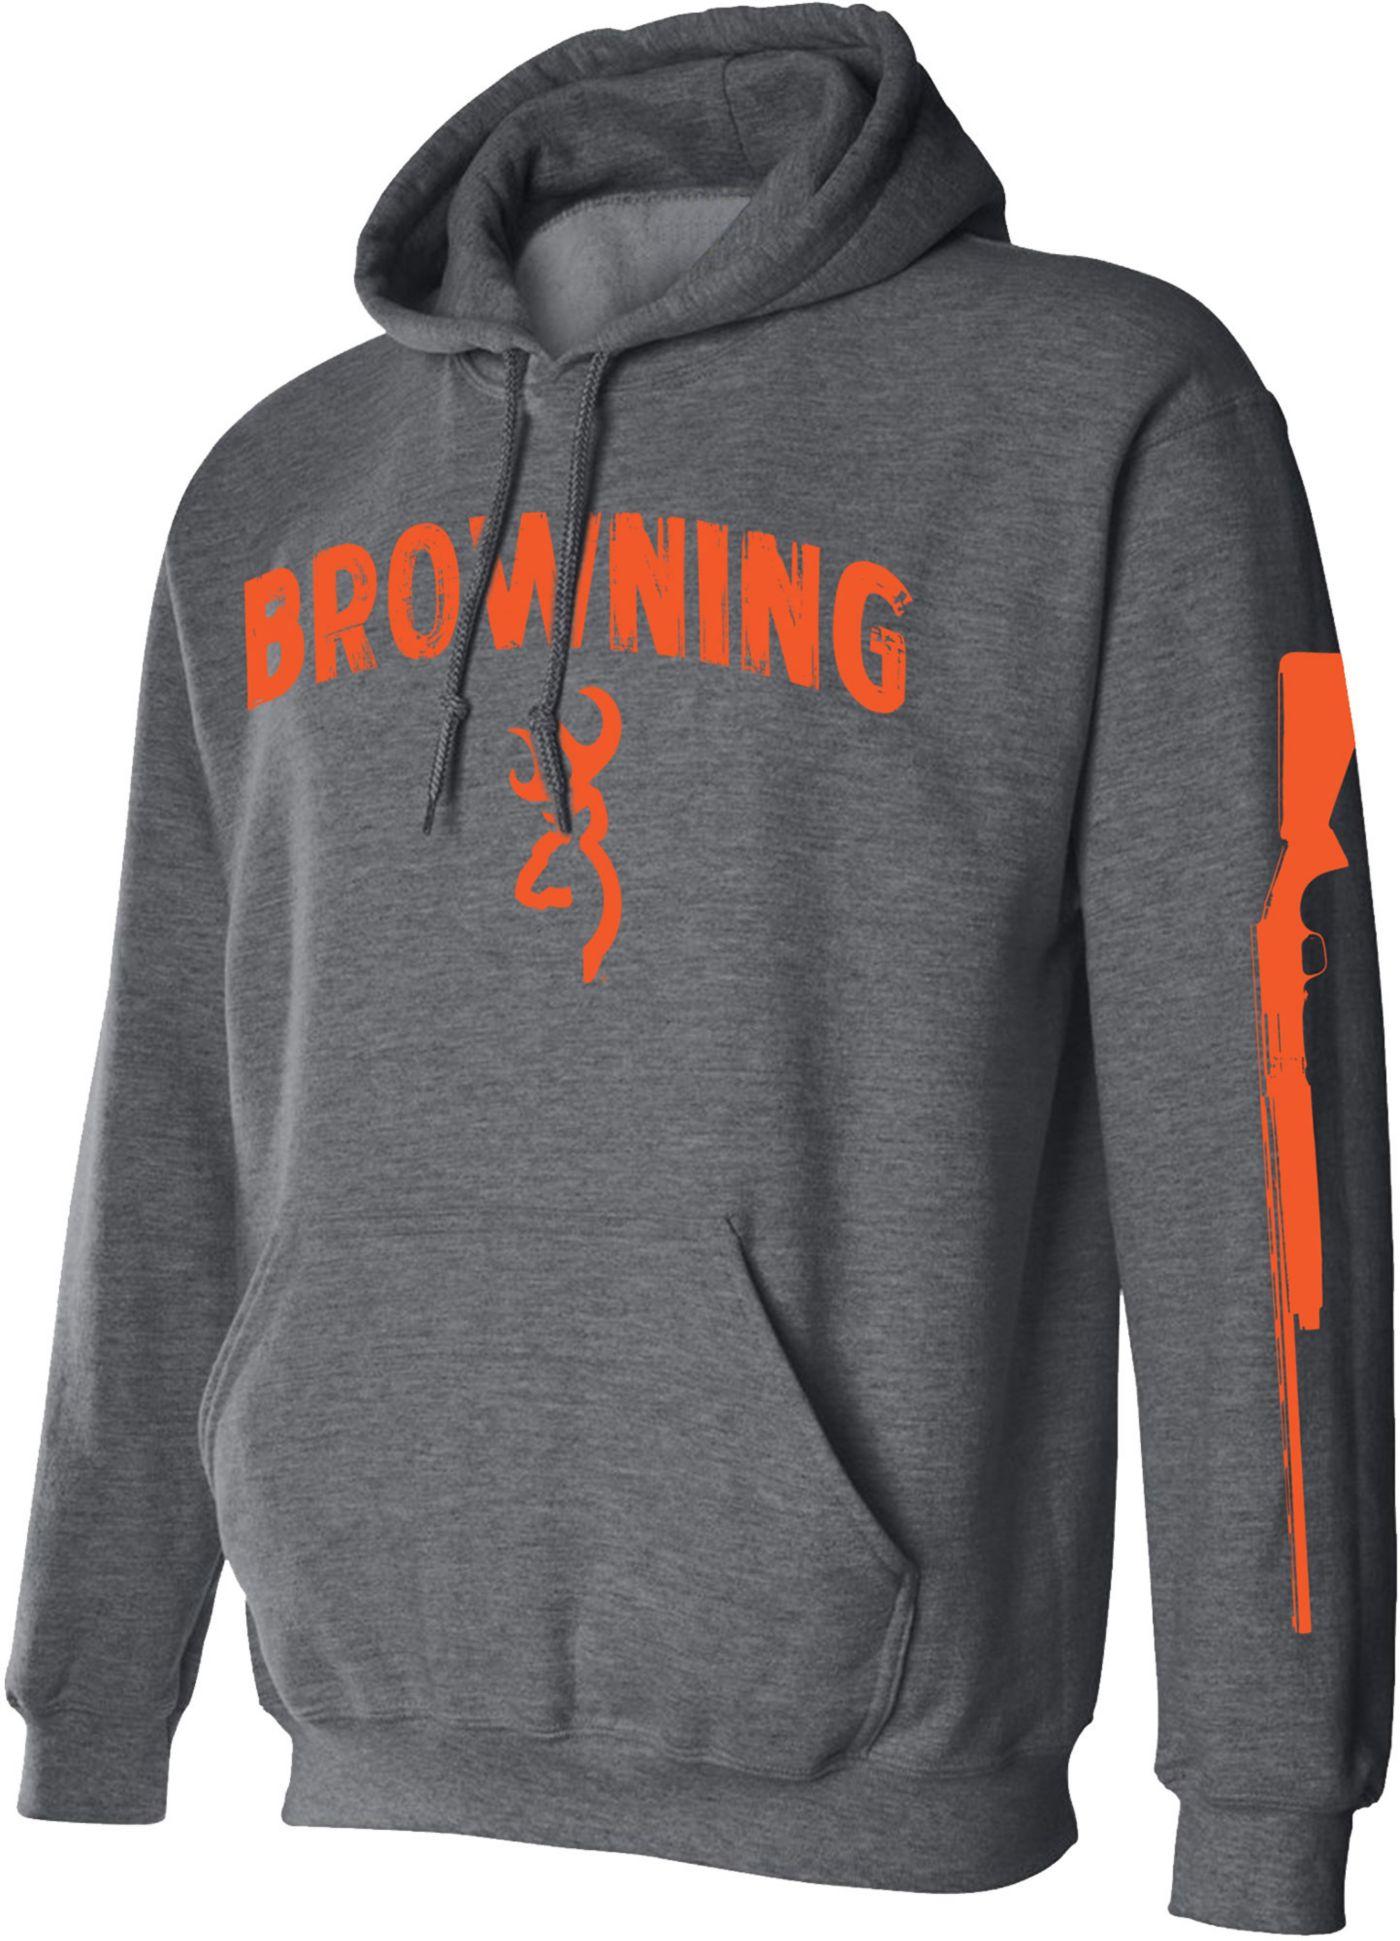 Browning Men's Shotgun Sleeve Fleece Hoodie